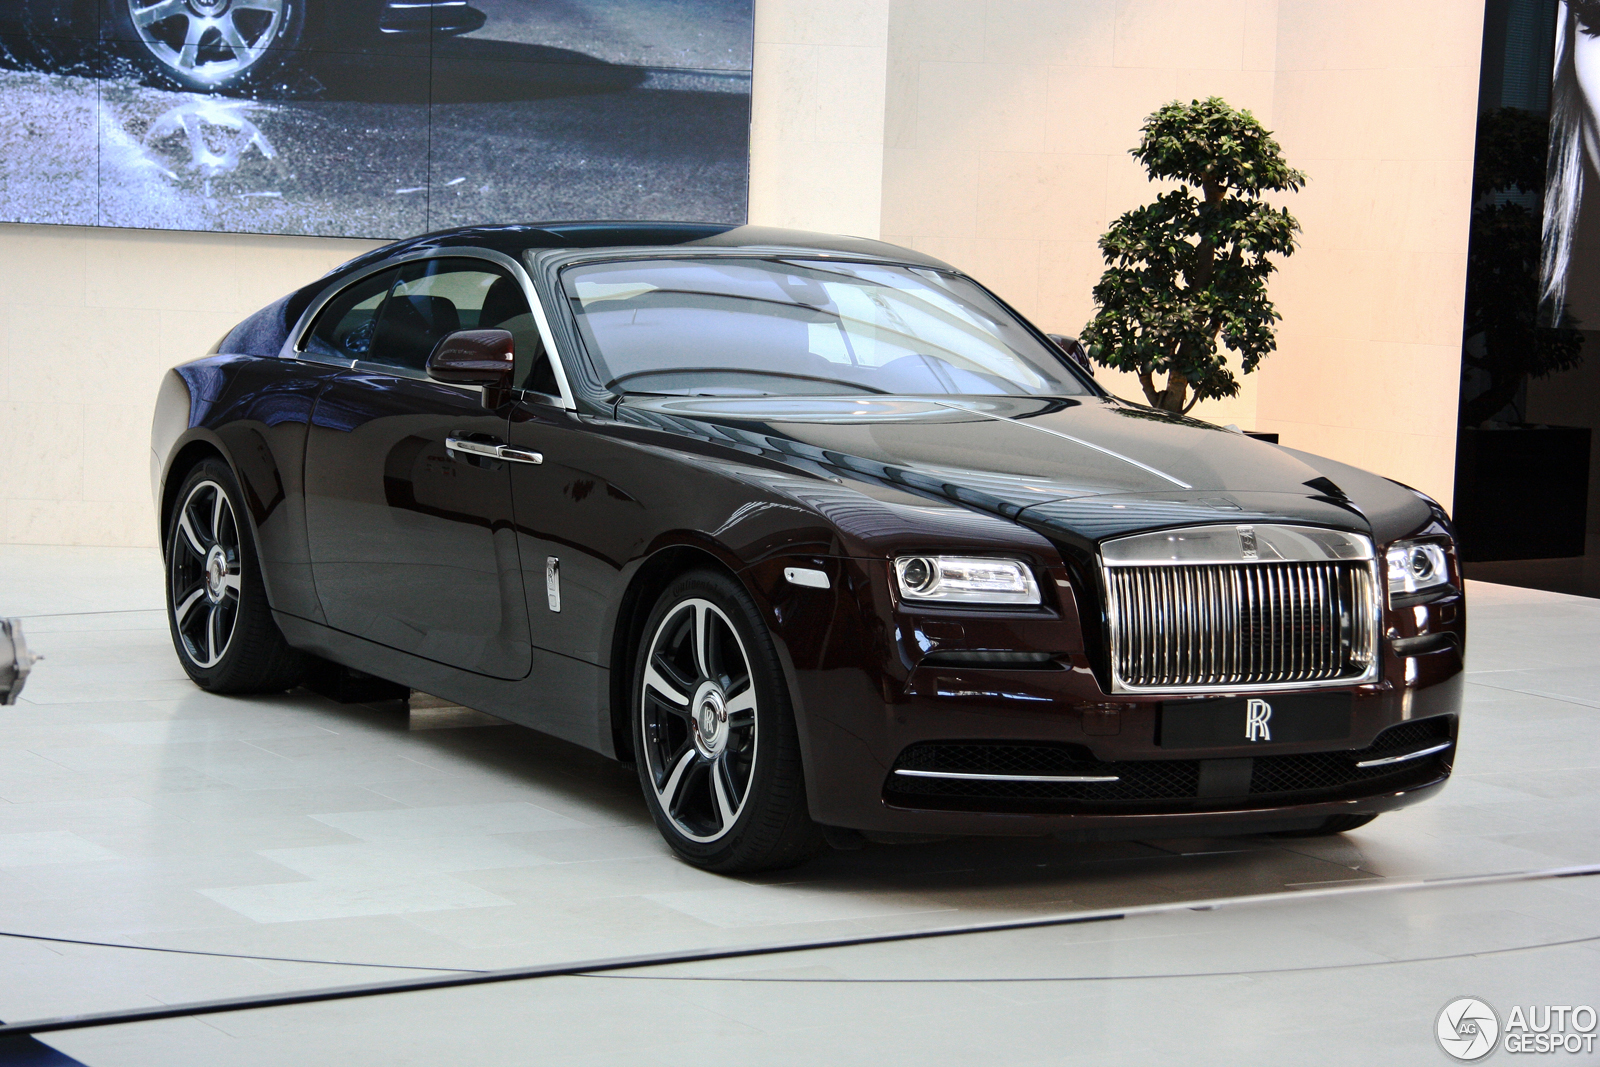 Bmw Shows Beautiful Rolls Royce Wraith At Bmw Welt